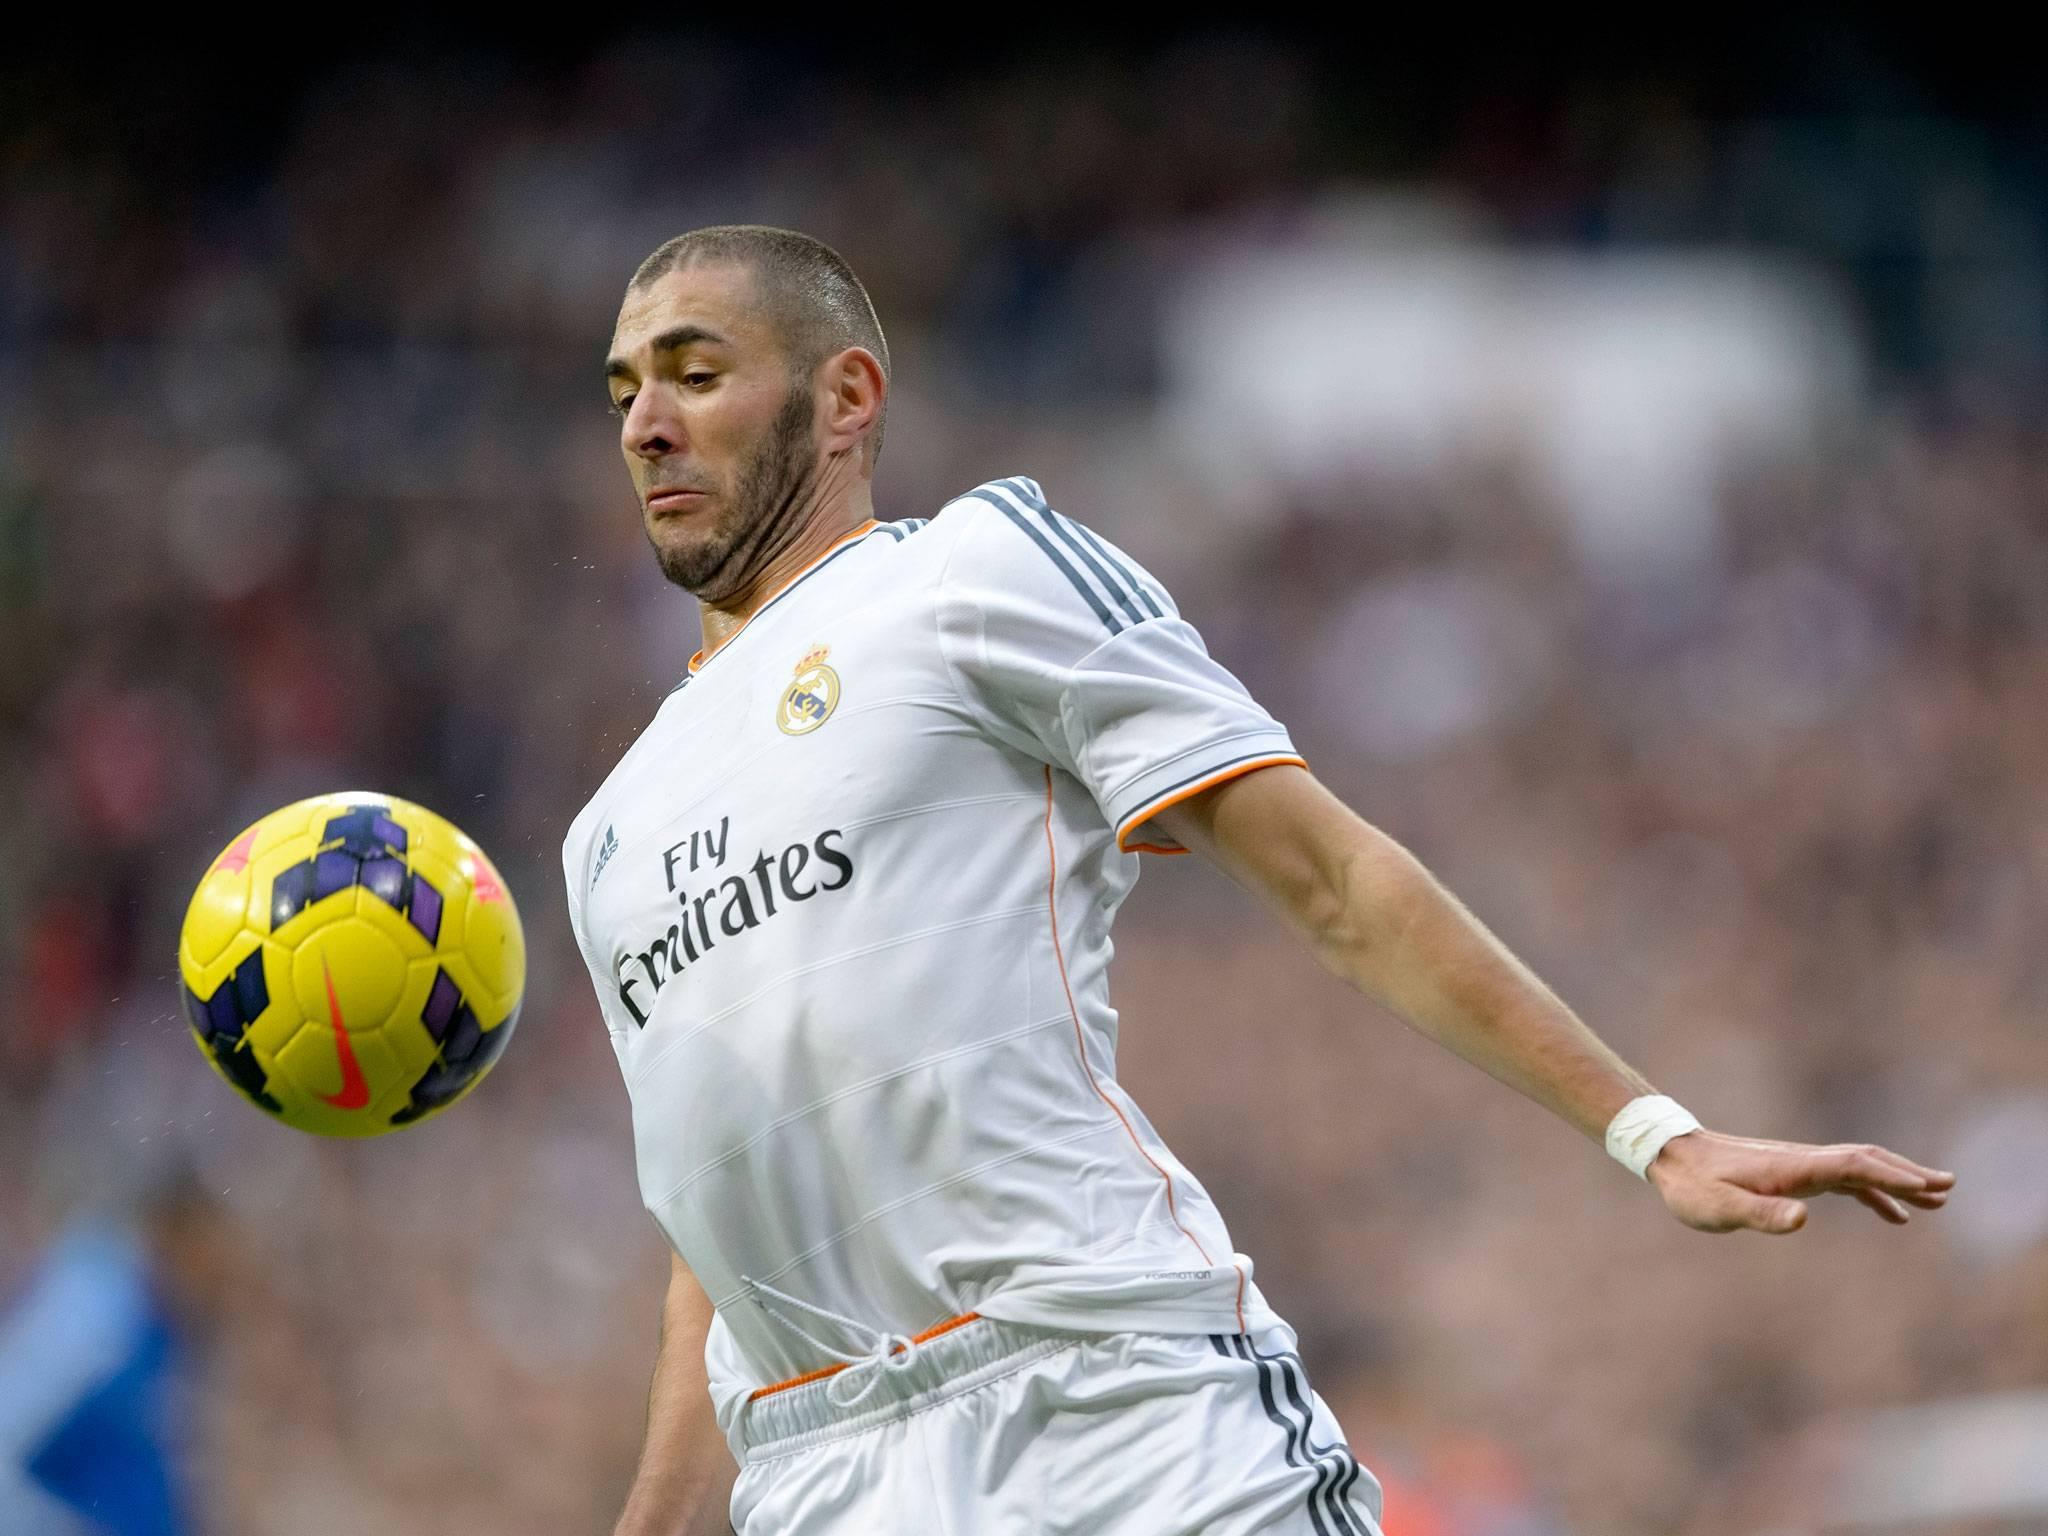 The player of Real Madrid Karim - 238.2KB